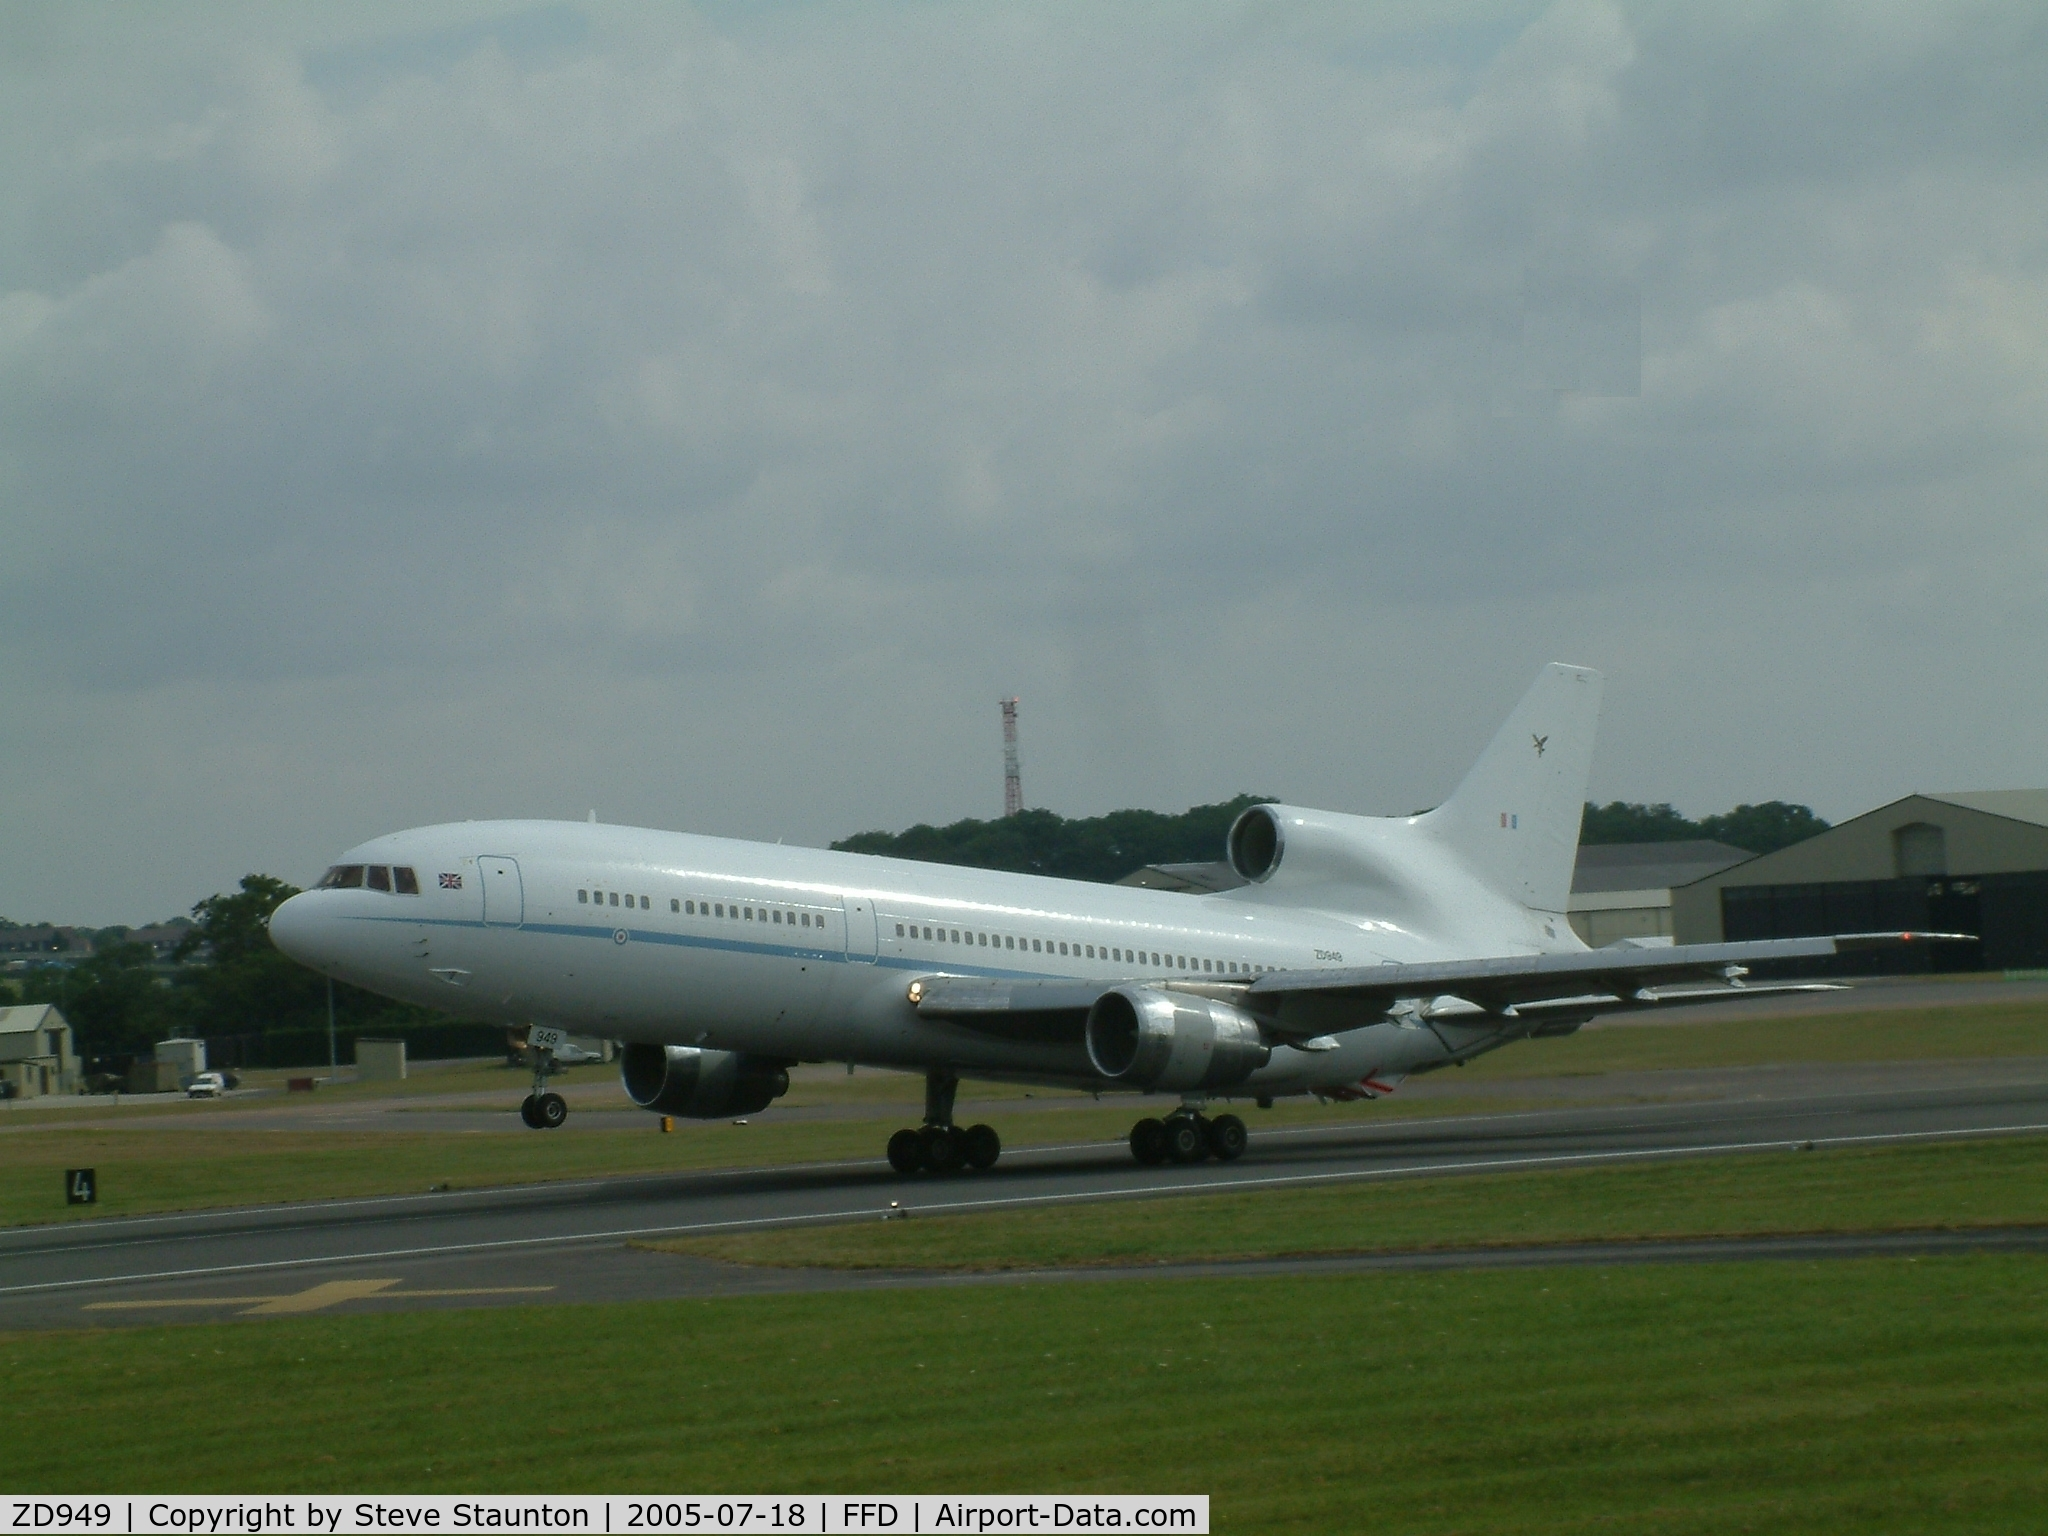 ZD949, 1979 Lockheed L-1011-385-3 TriStar K1 (500) C/N 193V-1159, Royal International Air Tattoo 2005